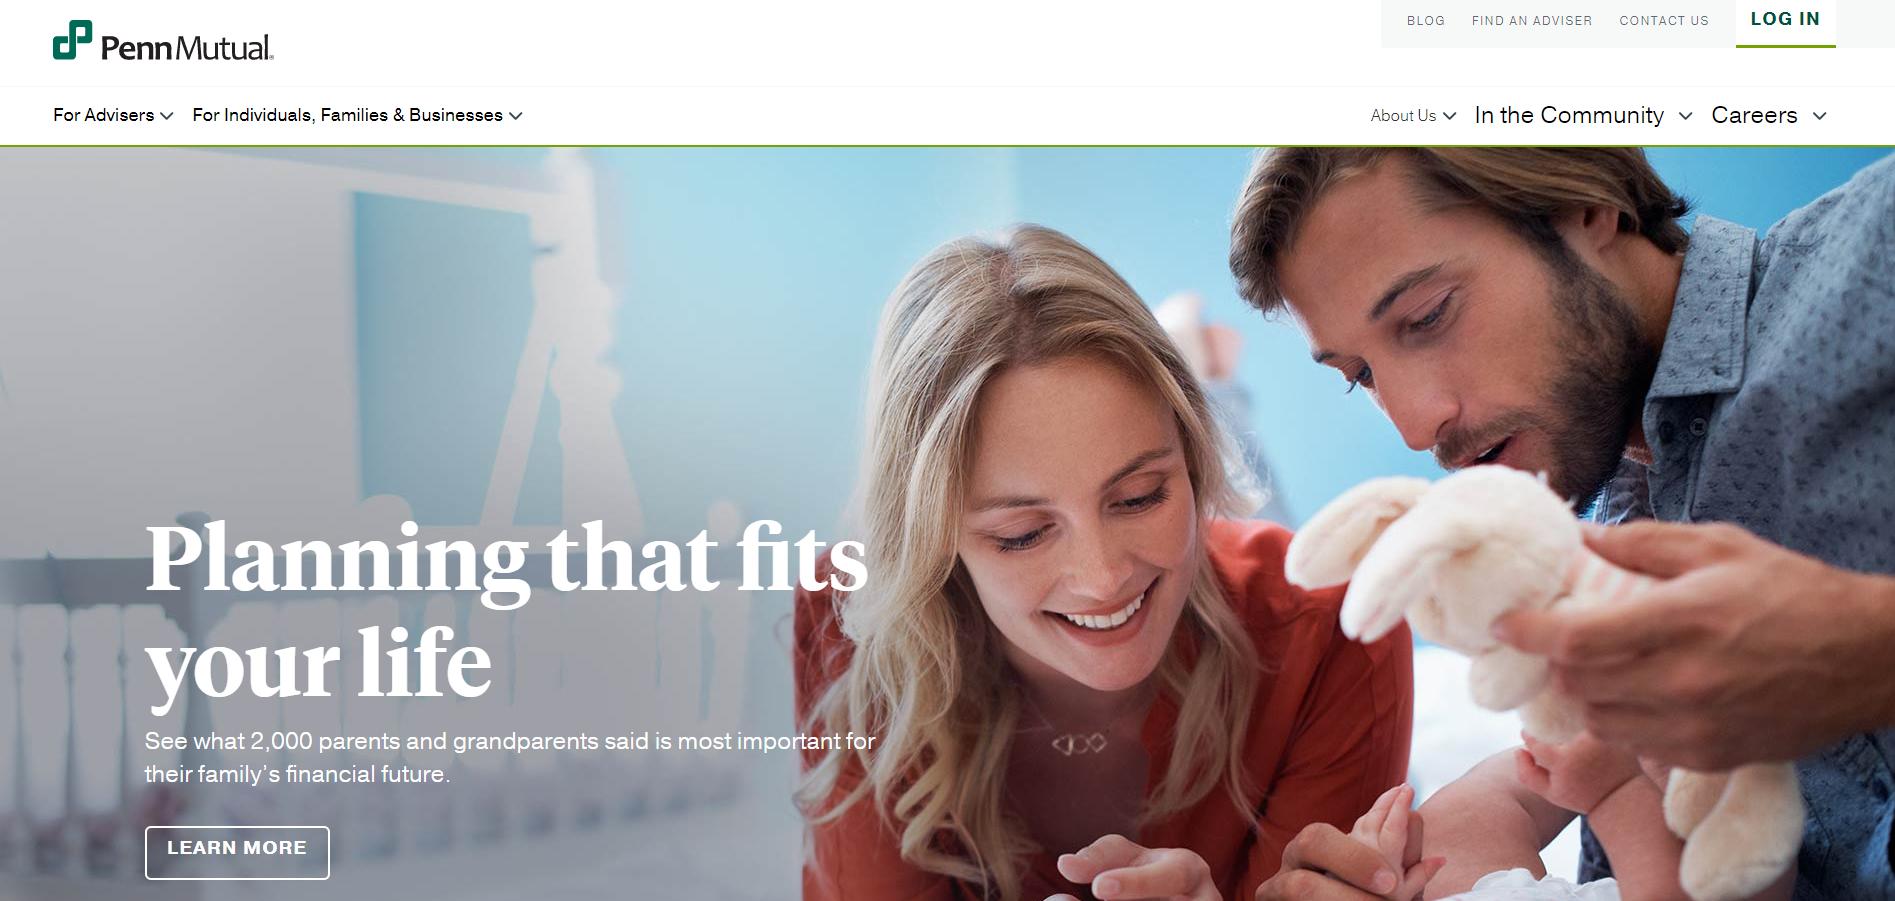 Penn Mutual Homepage